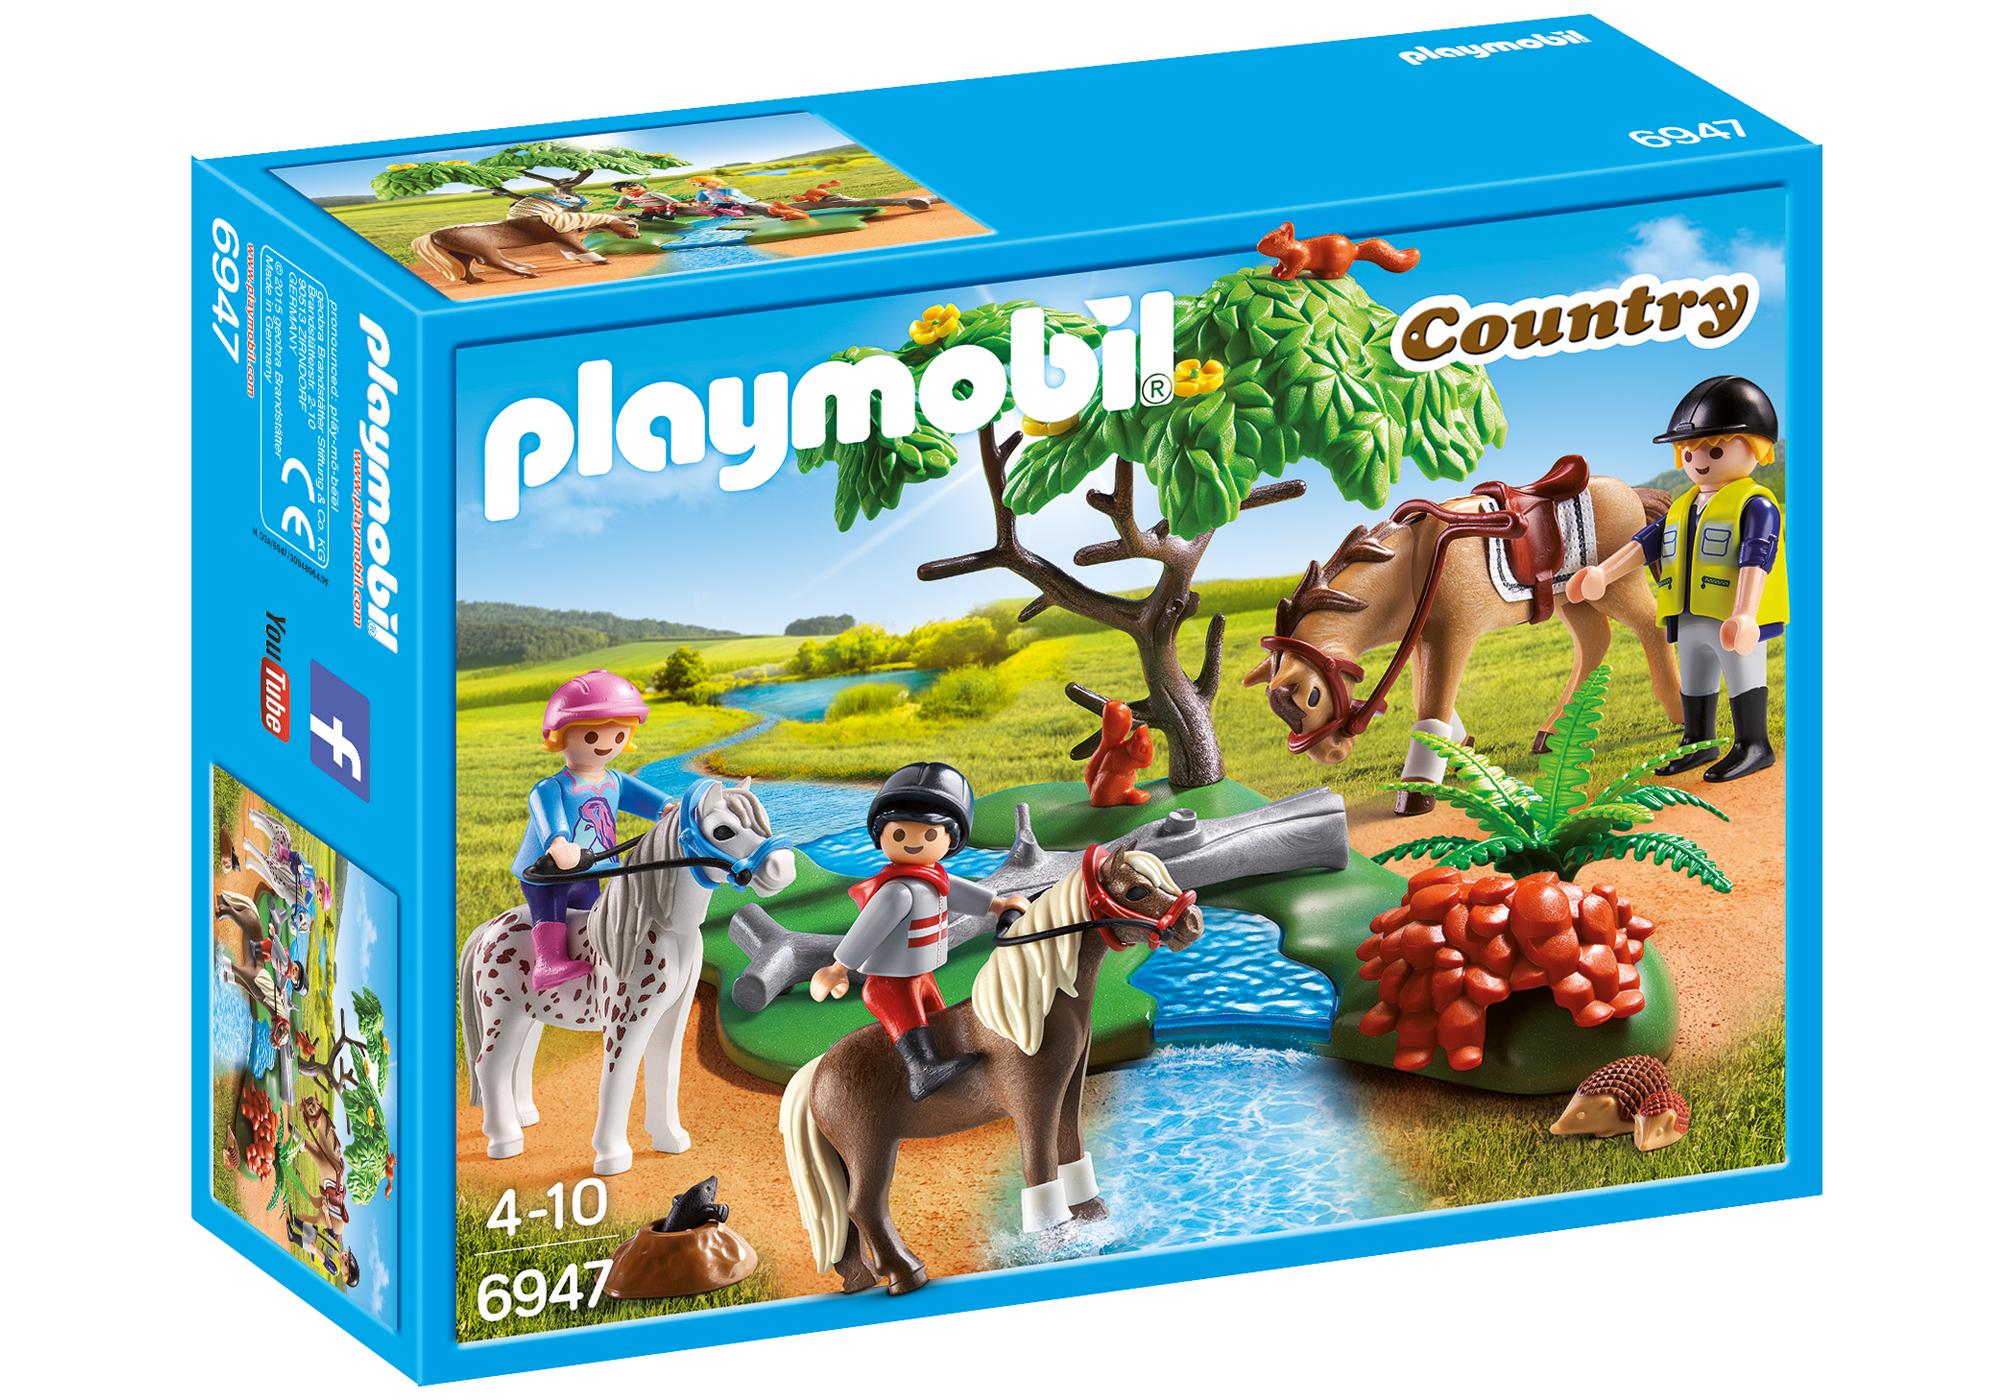 http://media.playmobil.com/i/playmobil/6947_product_box_front/Παιδάκια με πόνυ και εκπαιδευτής με άλογο